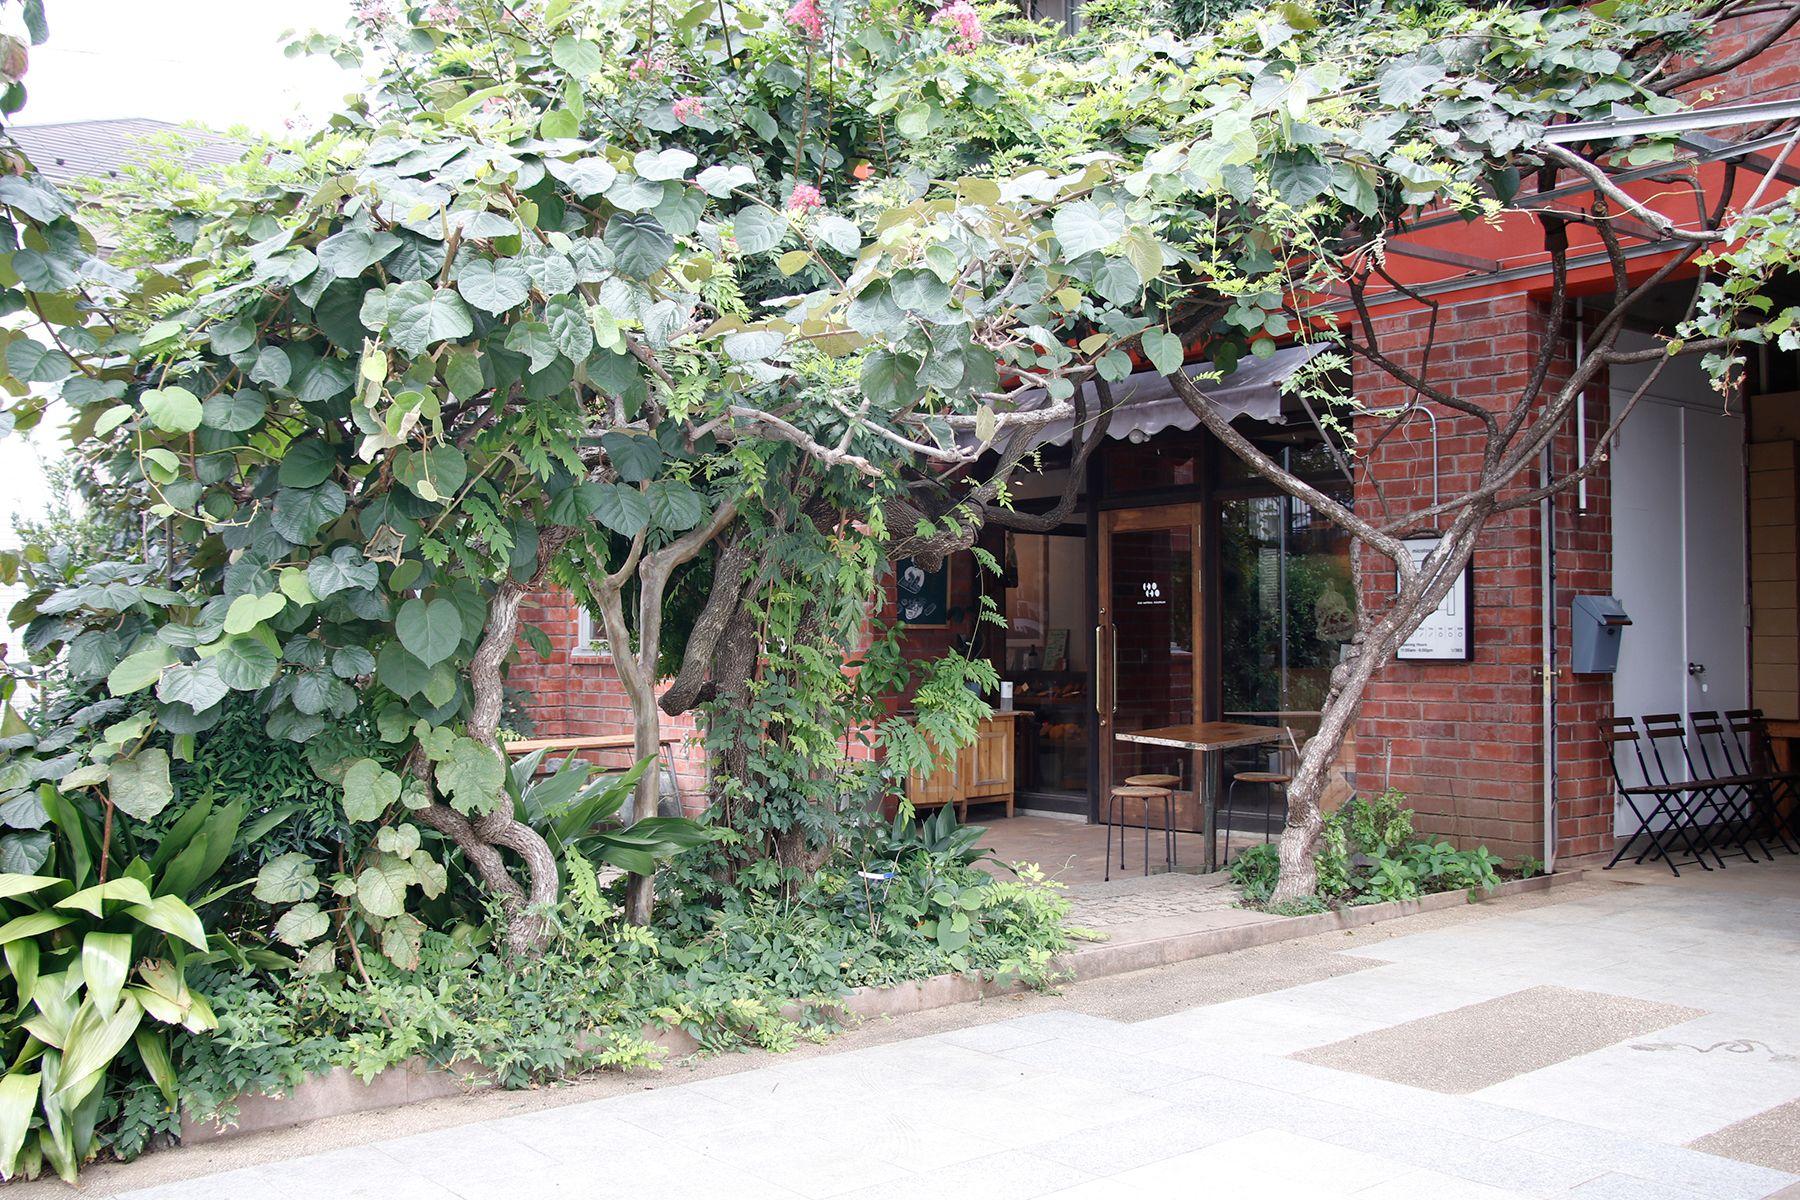 micotoya house (アイス屋/青果屋/shop)存在感ある緑